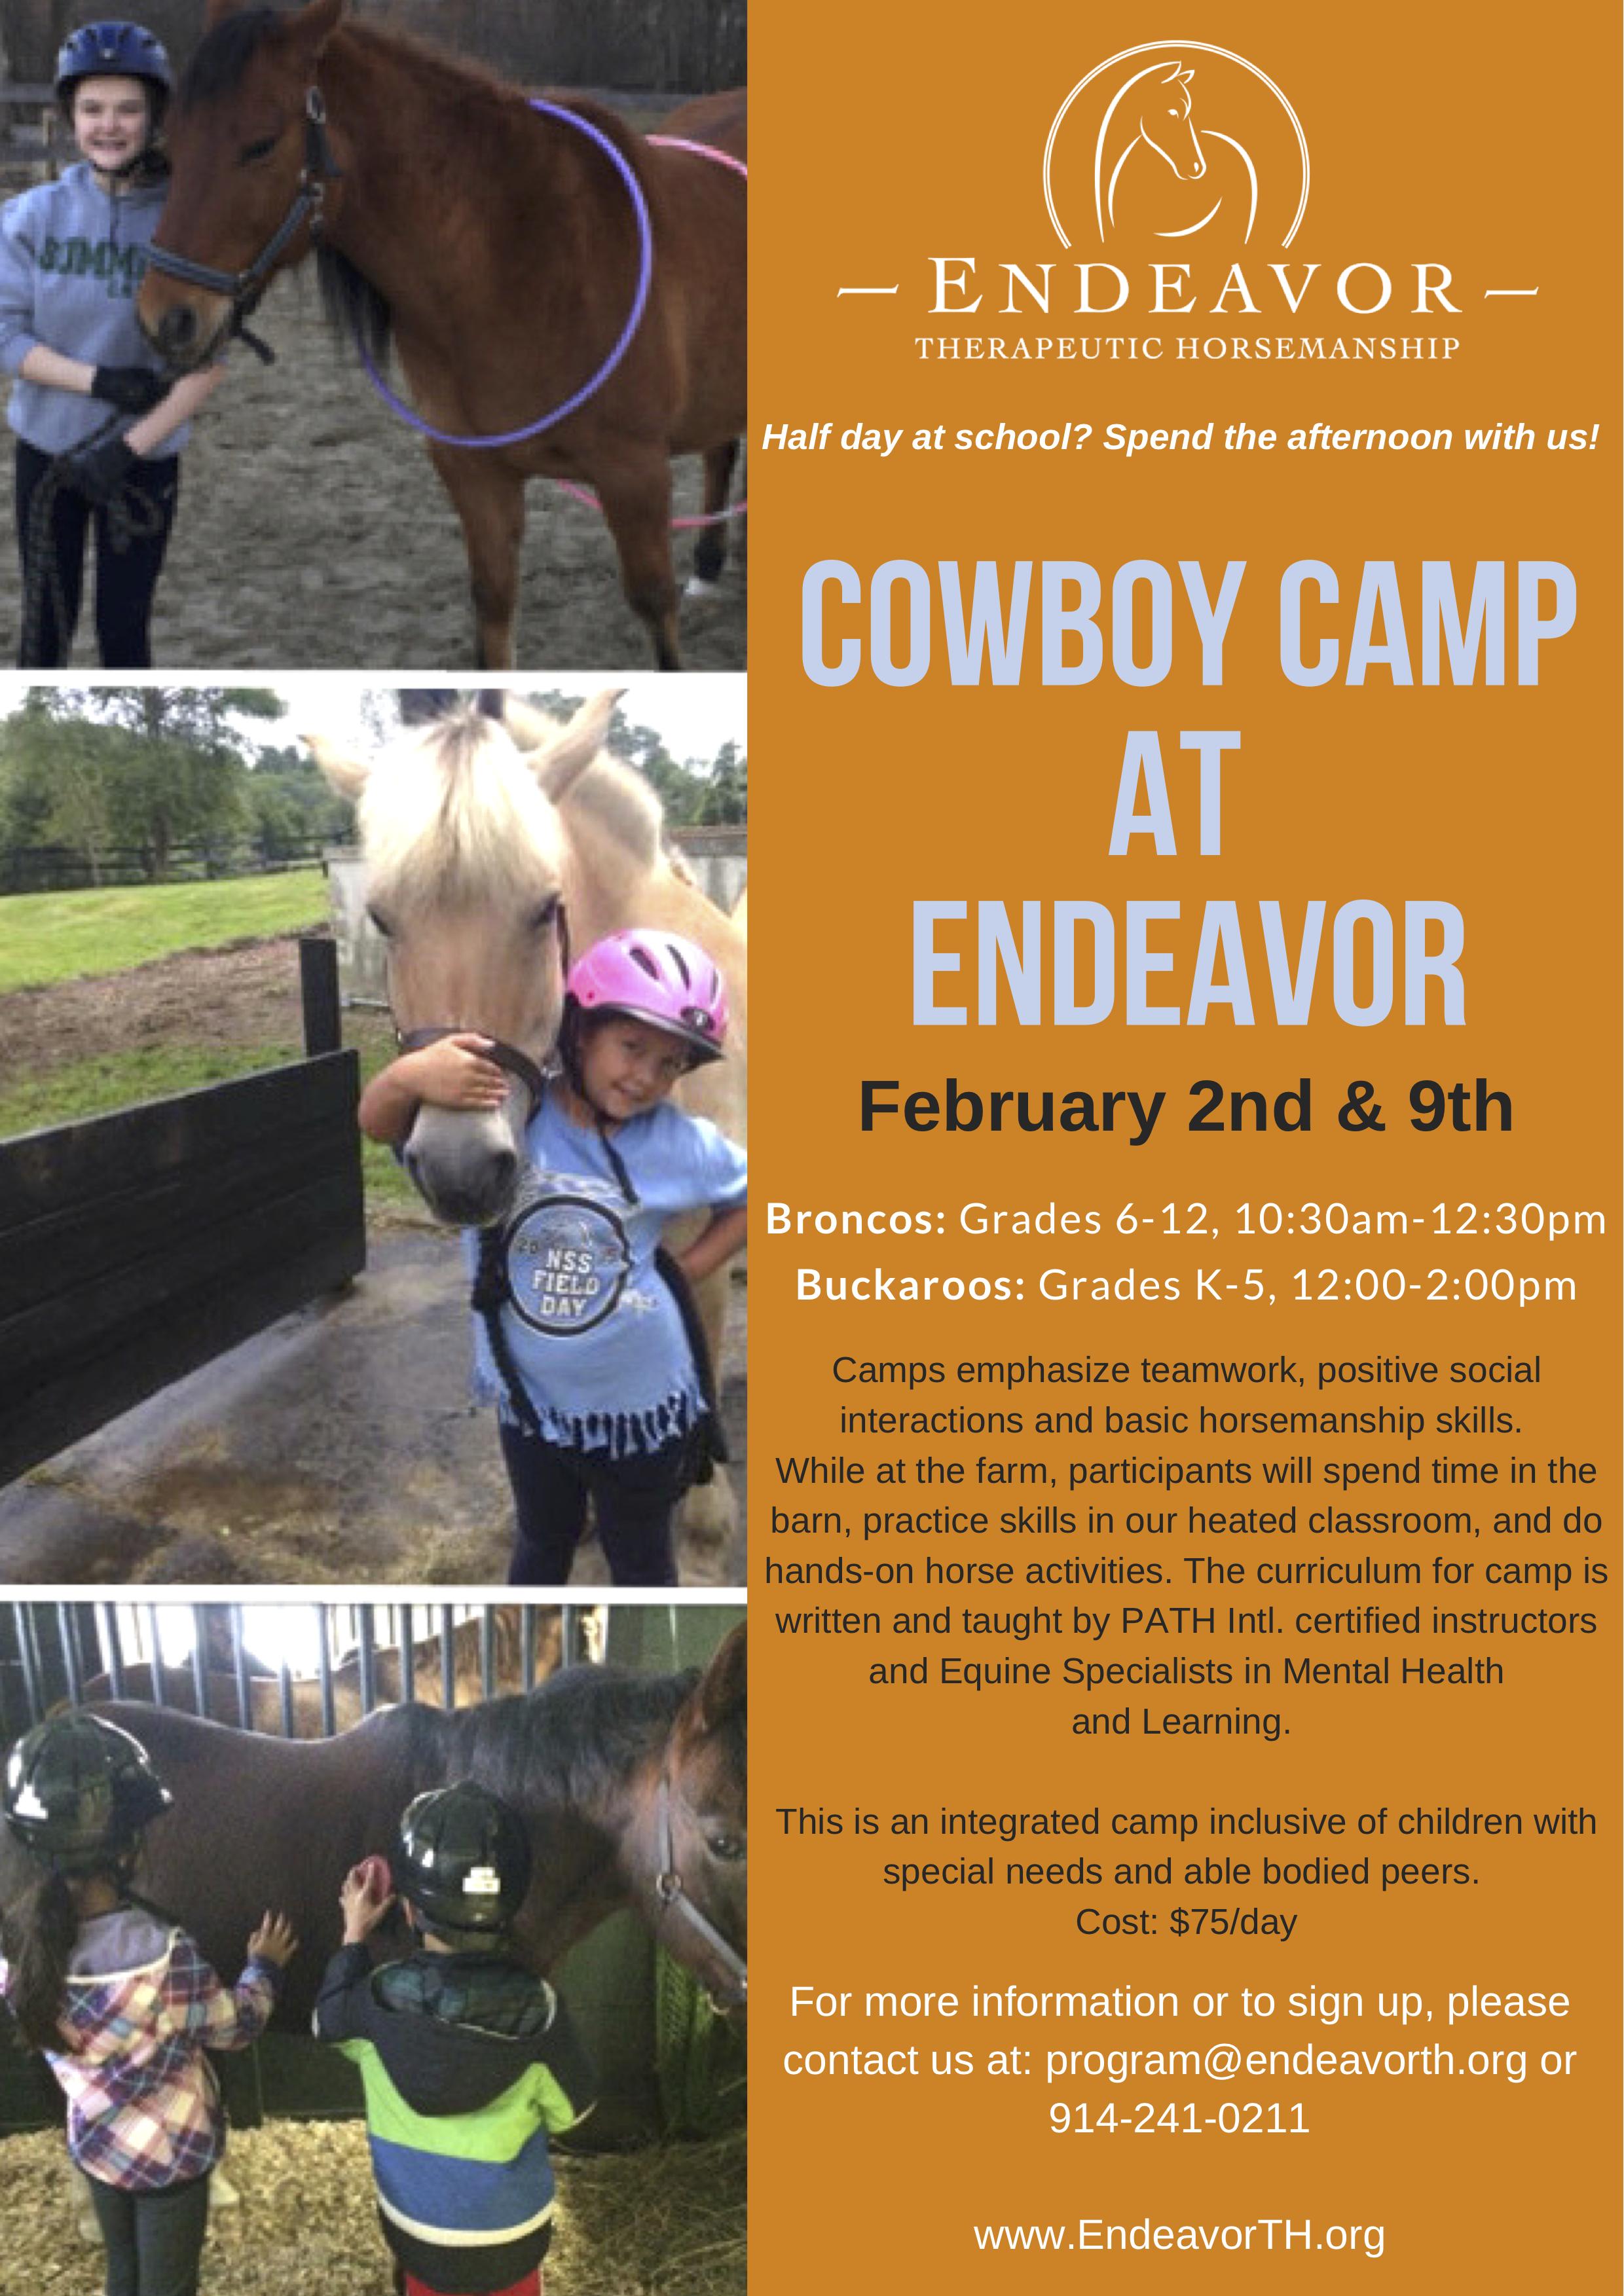 2018 Cowboy Camp At Endeavor_updated.png